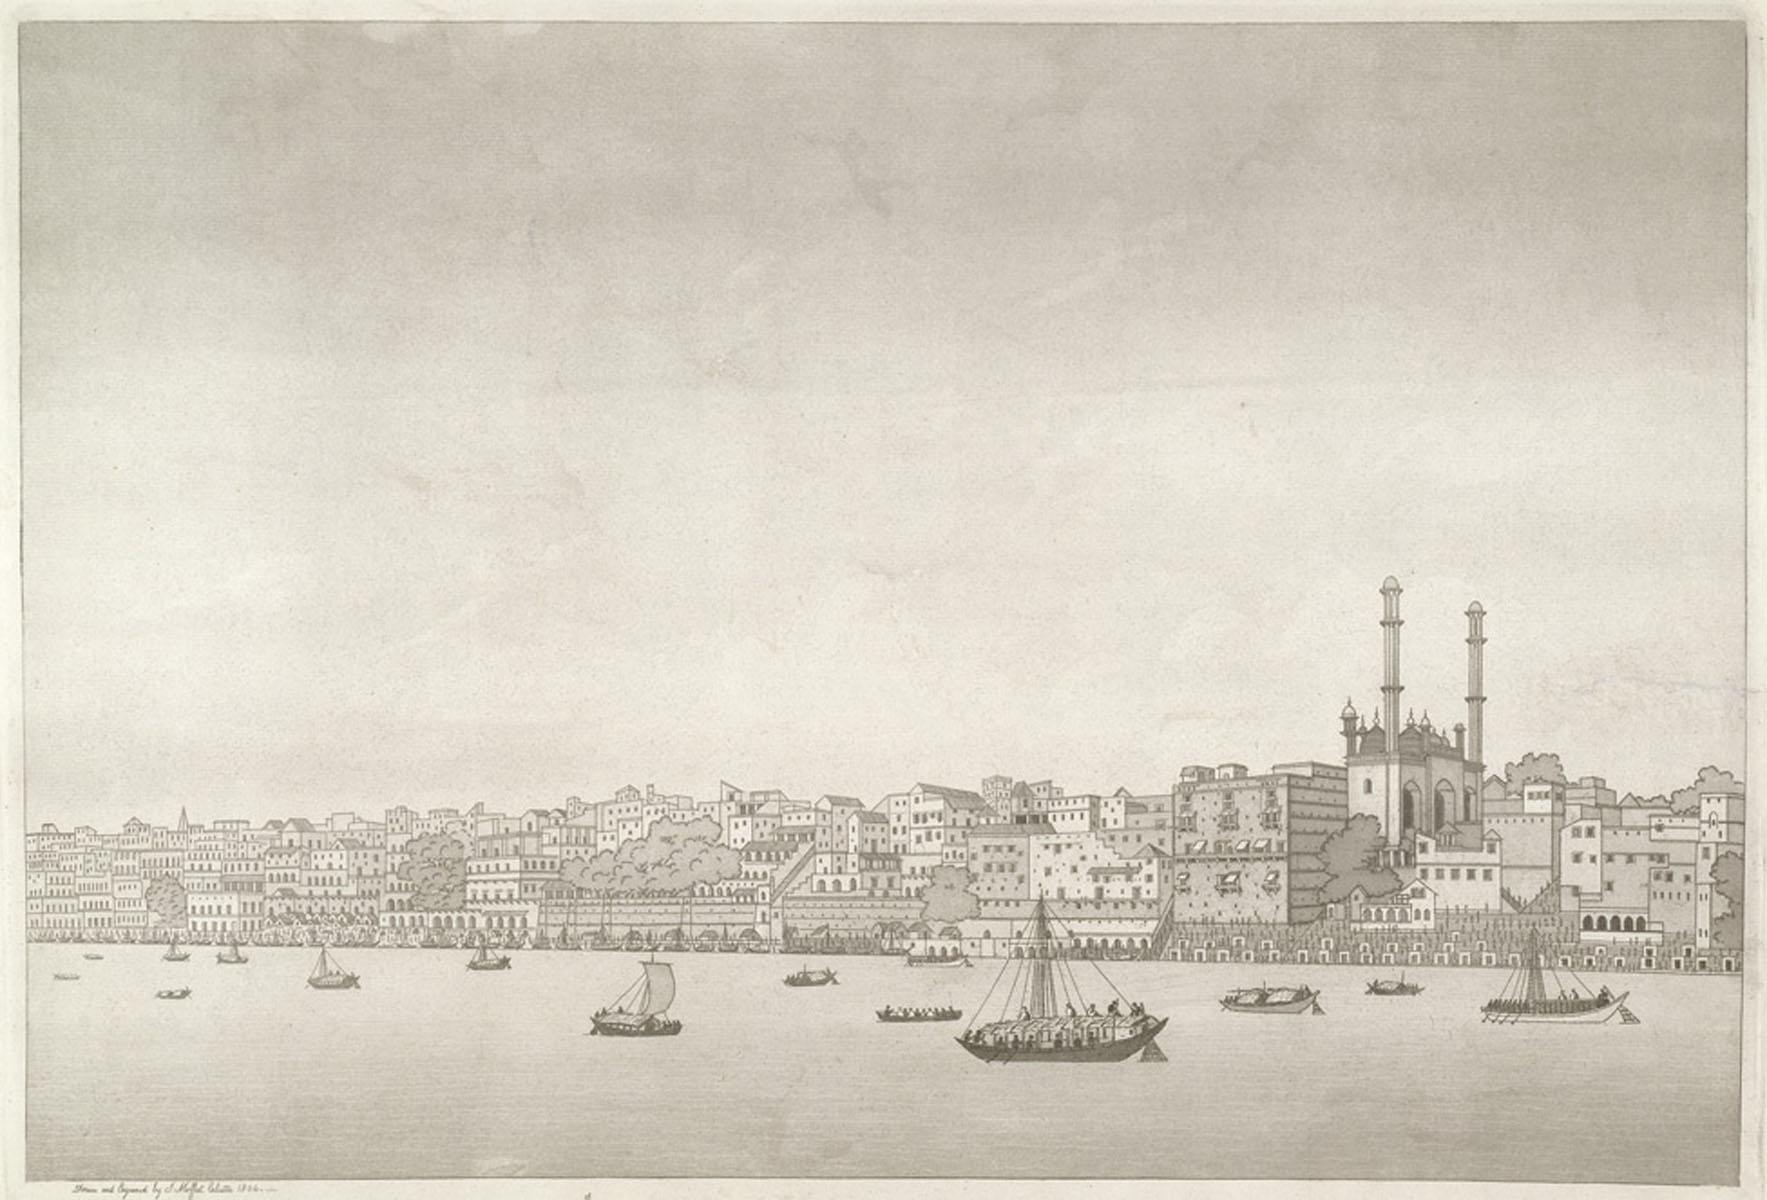 1st VIEW OF THE CITY OF BENARAS